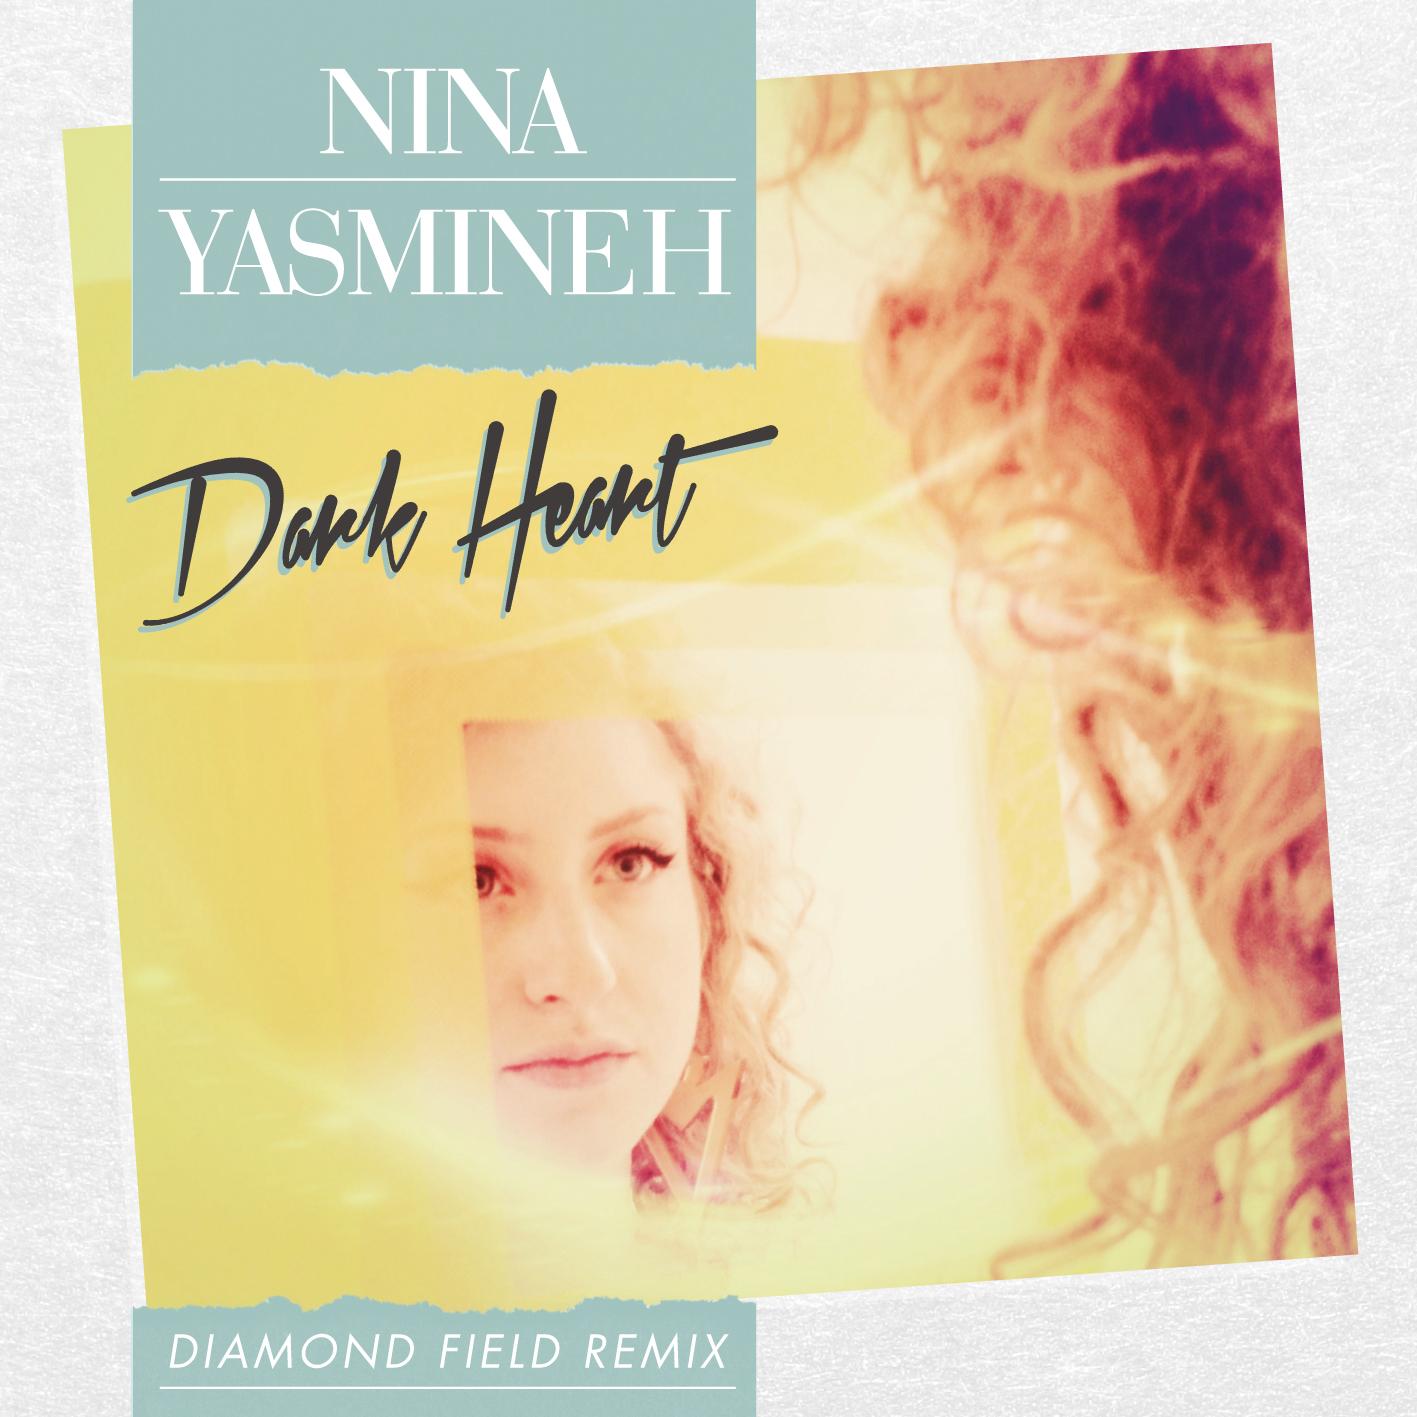 Nina Yasmineh 'Dark Heart' (Diamond Field Remix)